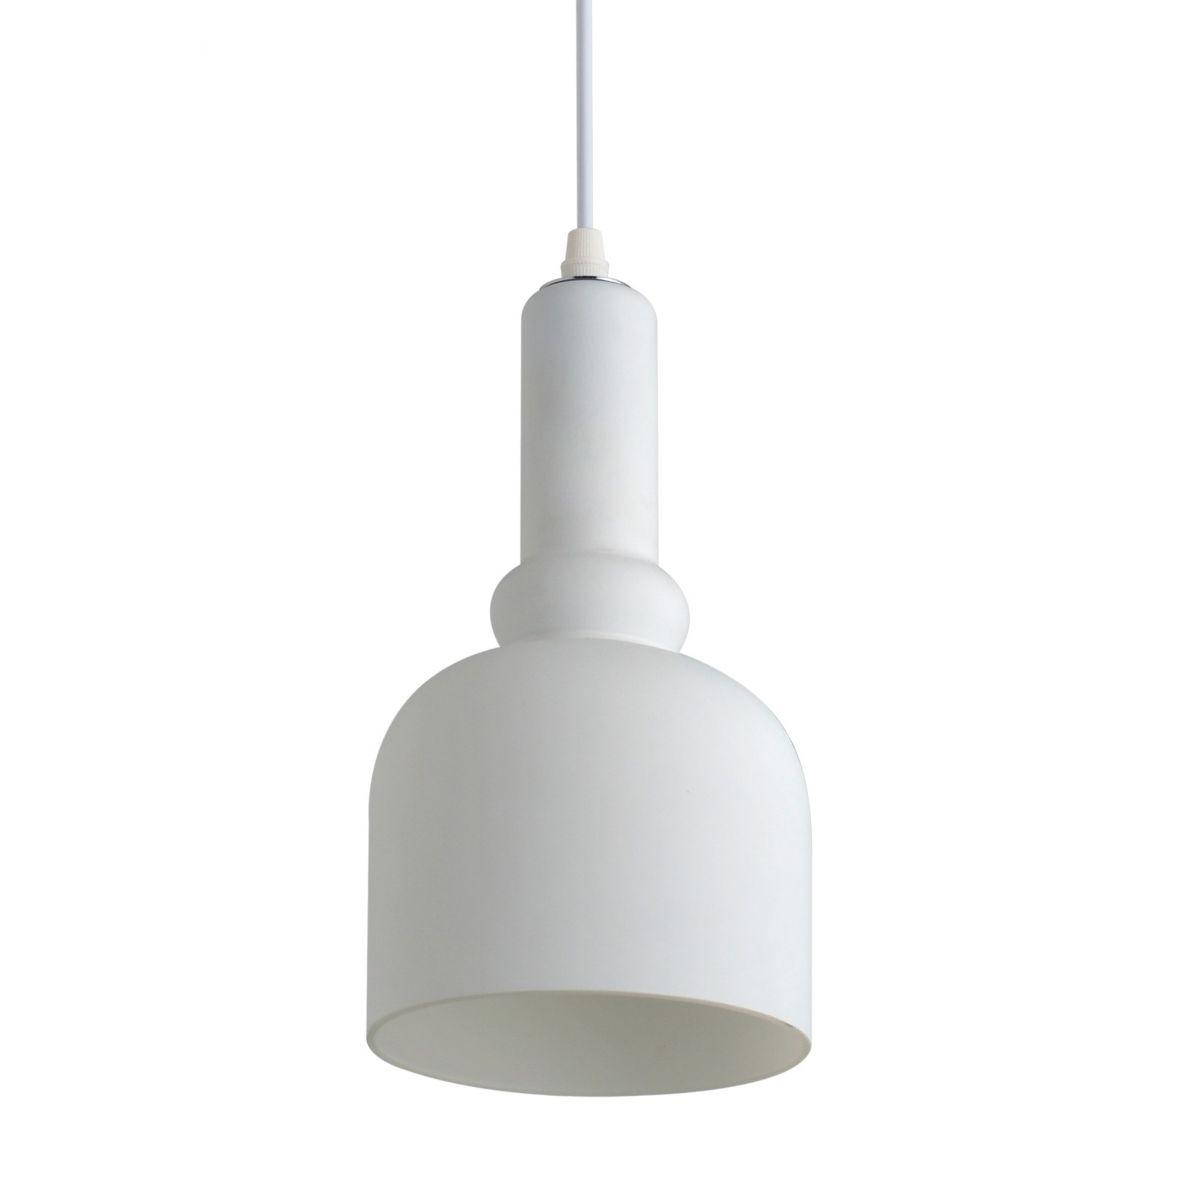 Luminária Pendente Vidro Branco Fosco  Ref: Lt-222-A